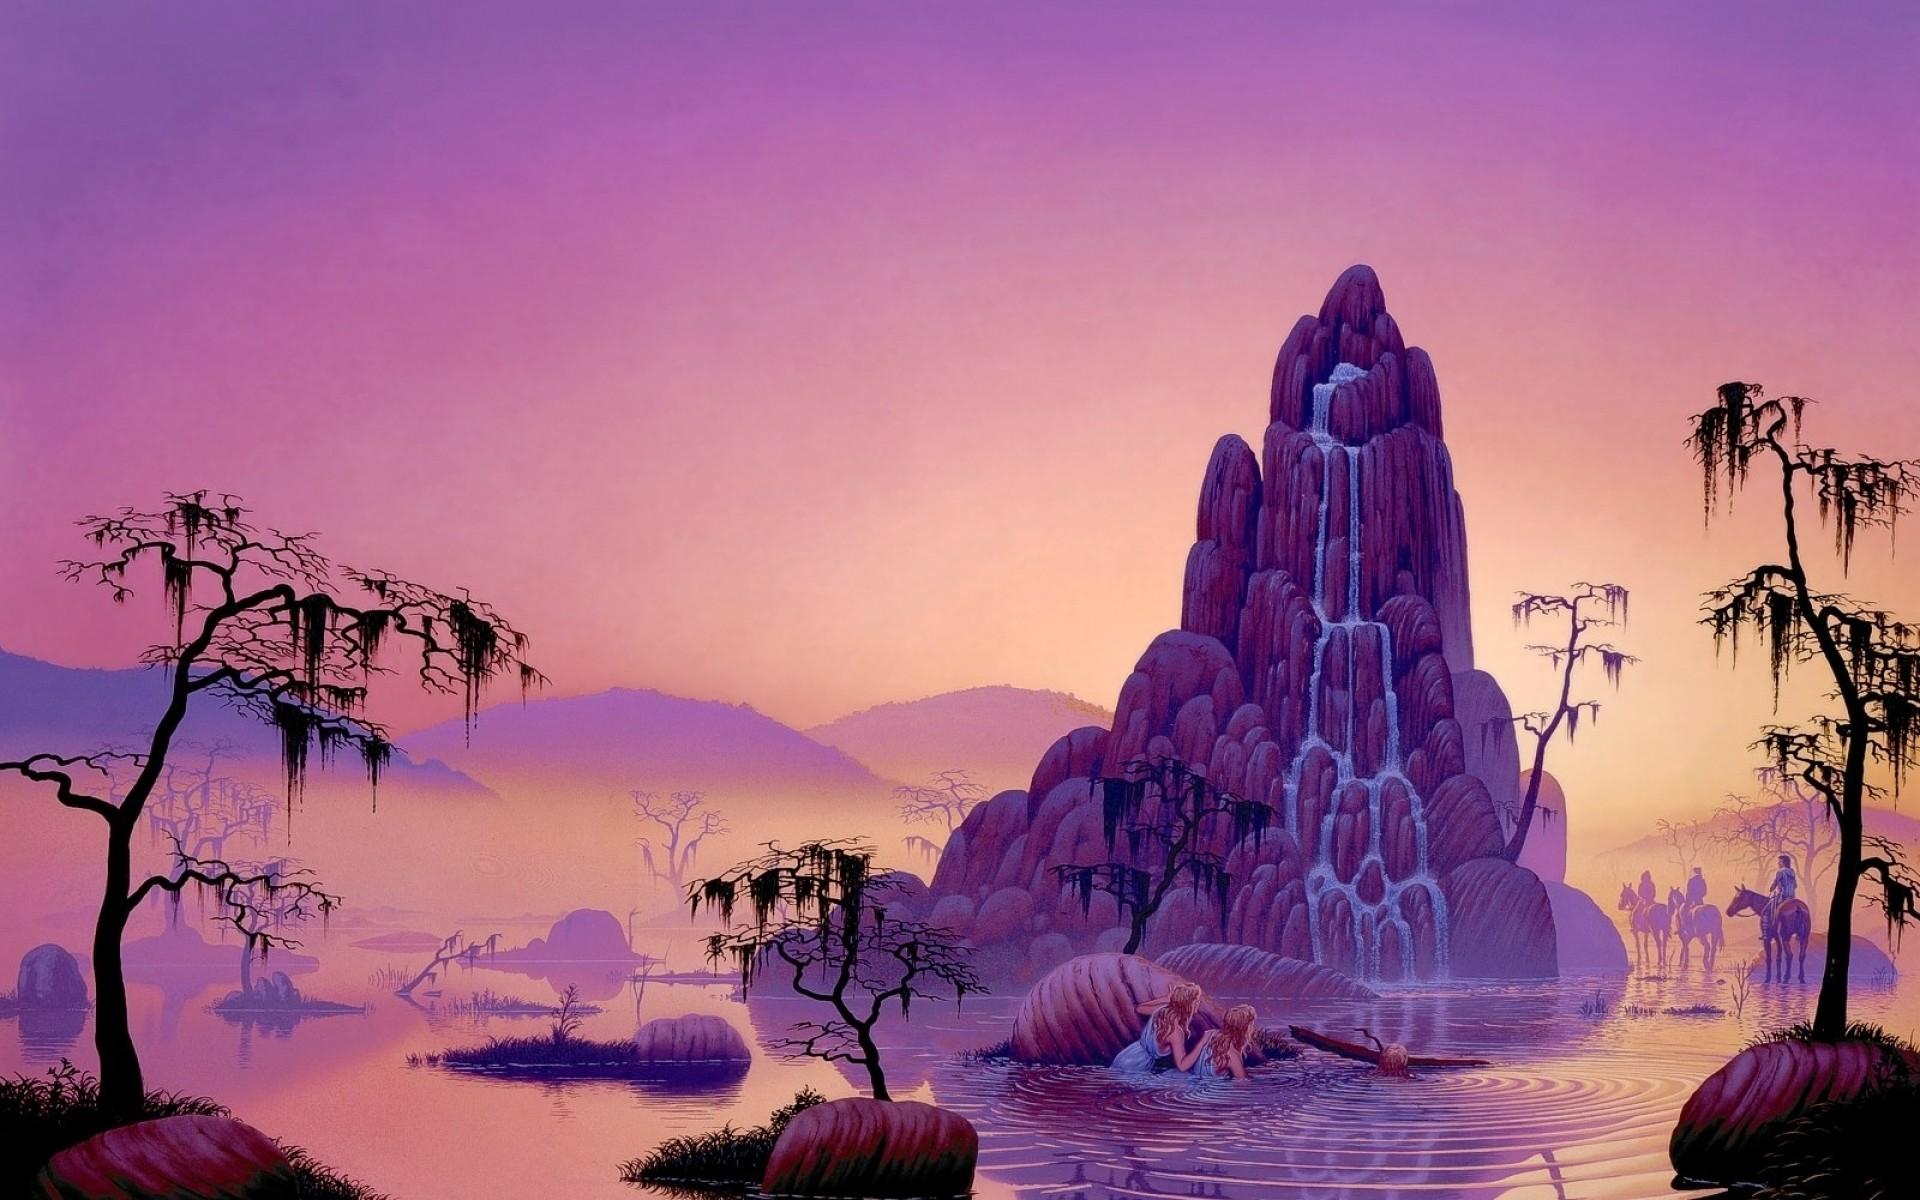 High Quality Purple Blue Iphone X Wallpaper Mermaid Background 183 ① Download Free Stunning Full Hd